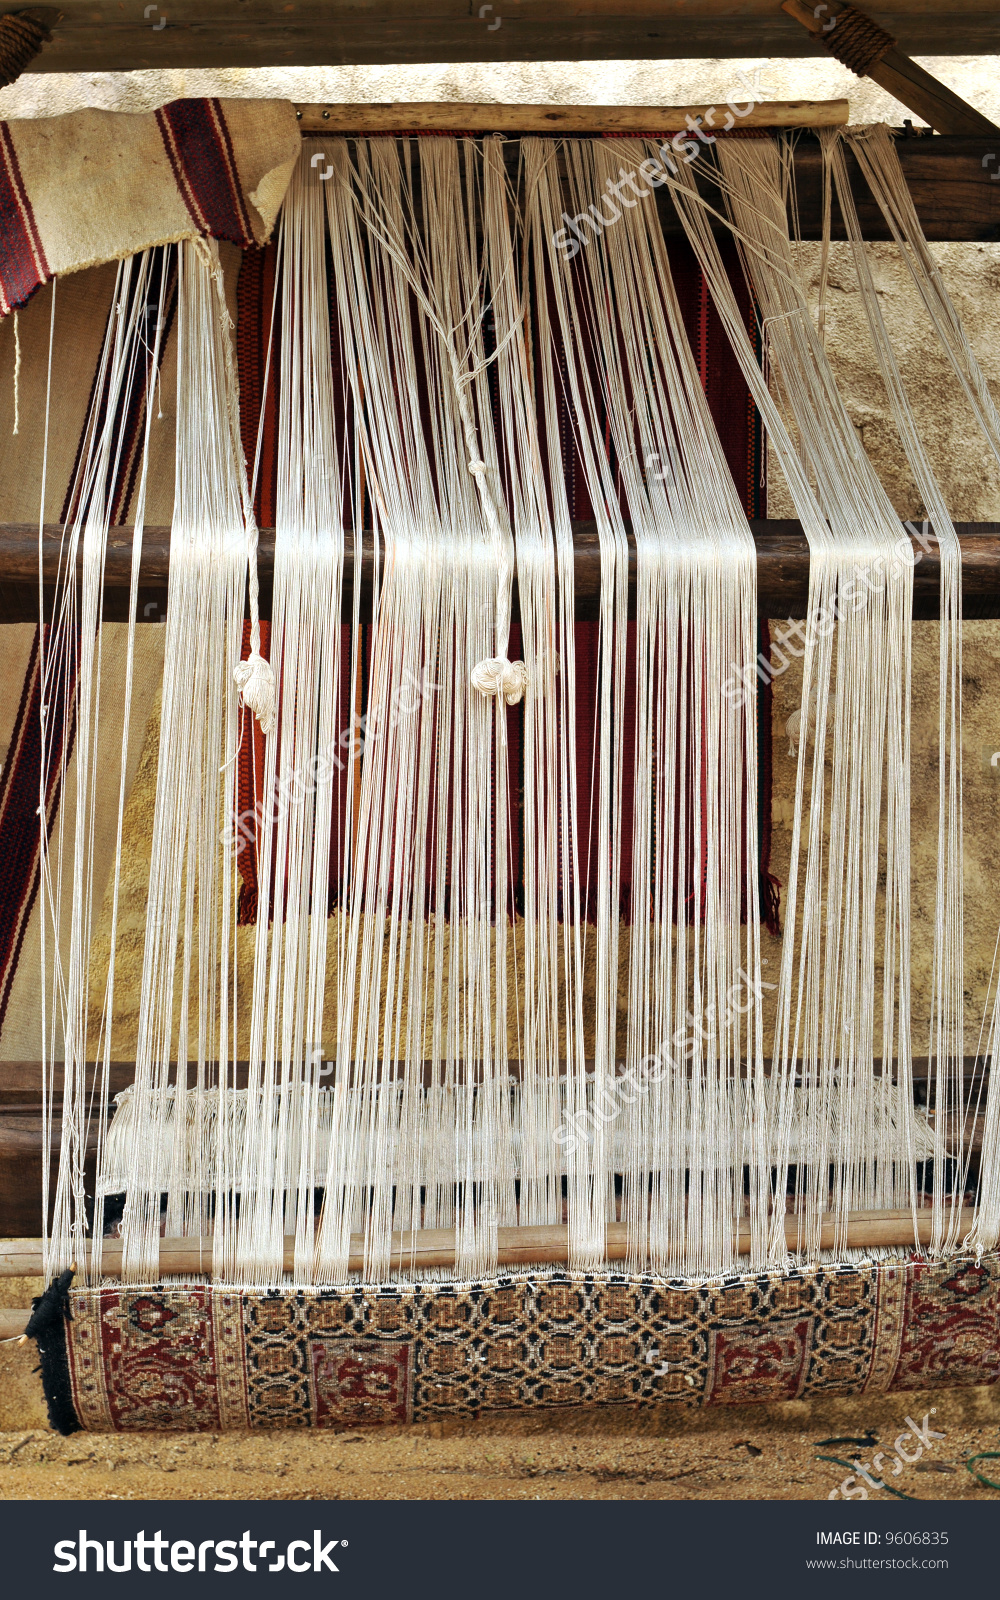 Ancient Rug Weaving.